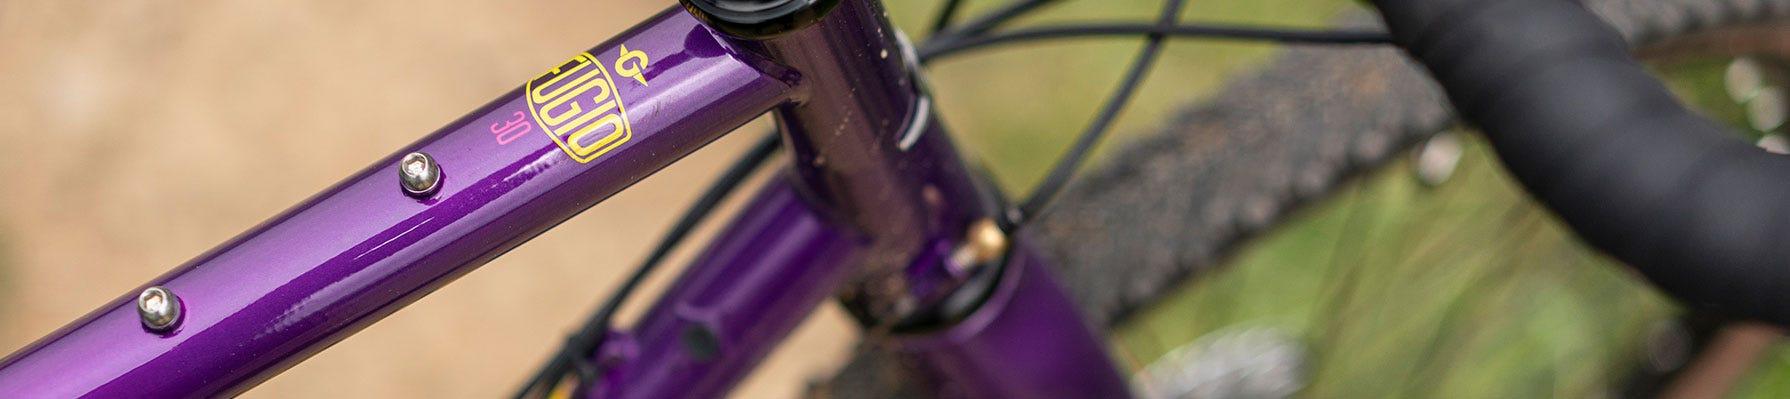 Adventure Sample Bikes